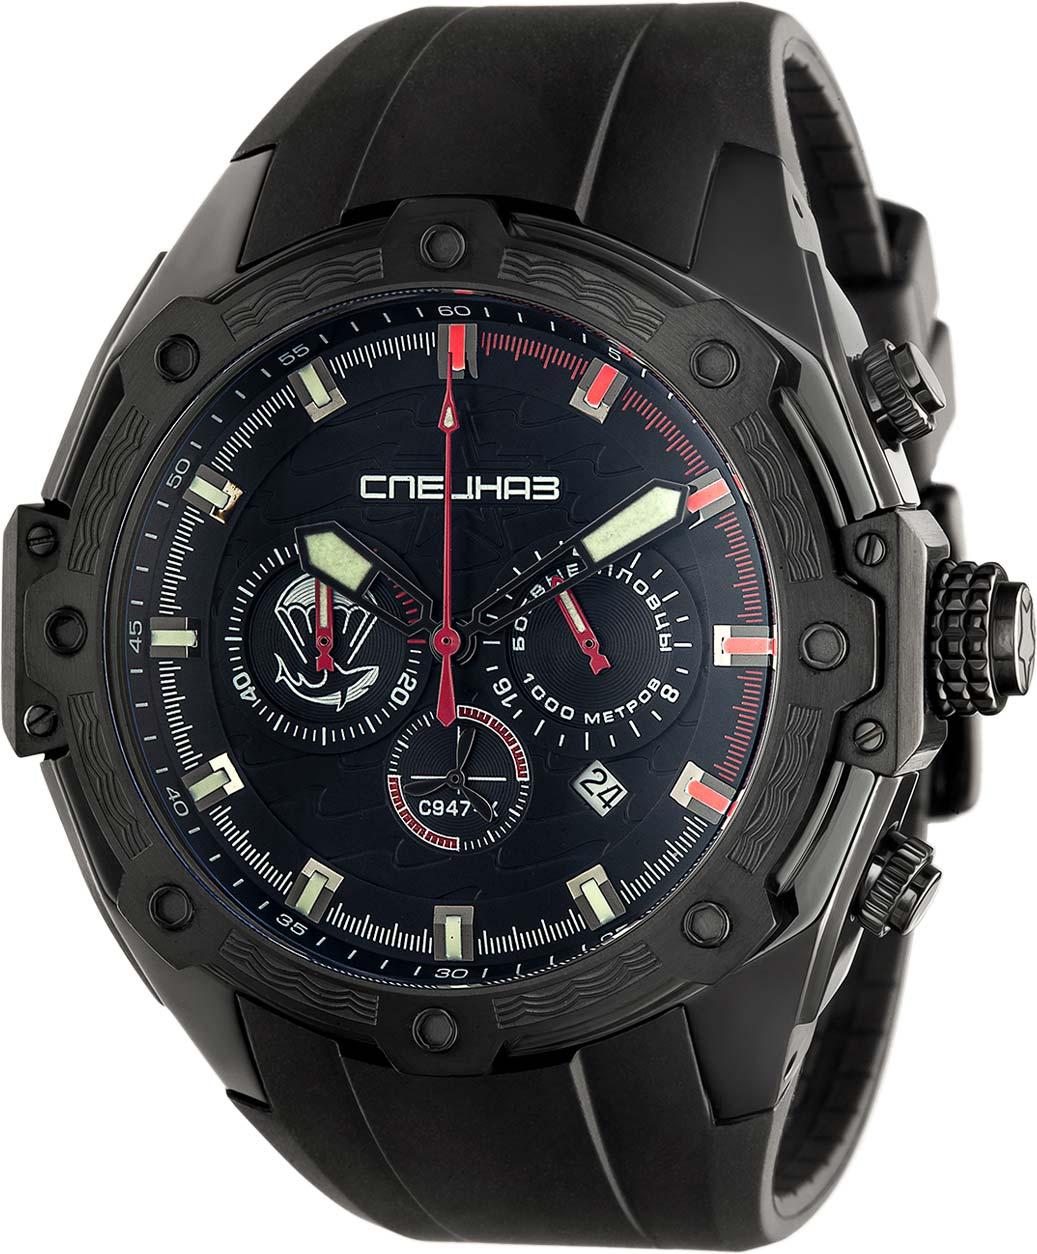 Фото - Мужские часы Спецназ C9474436-OS20 мужские часы спецназ c9370288 os20